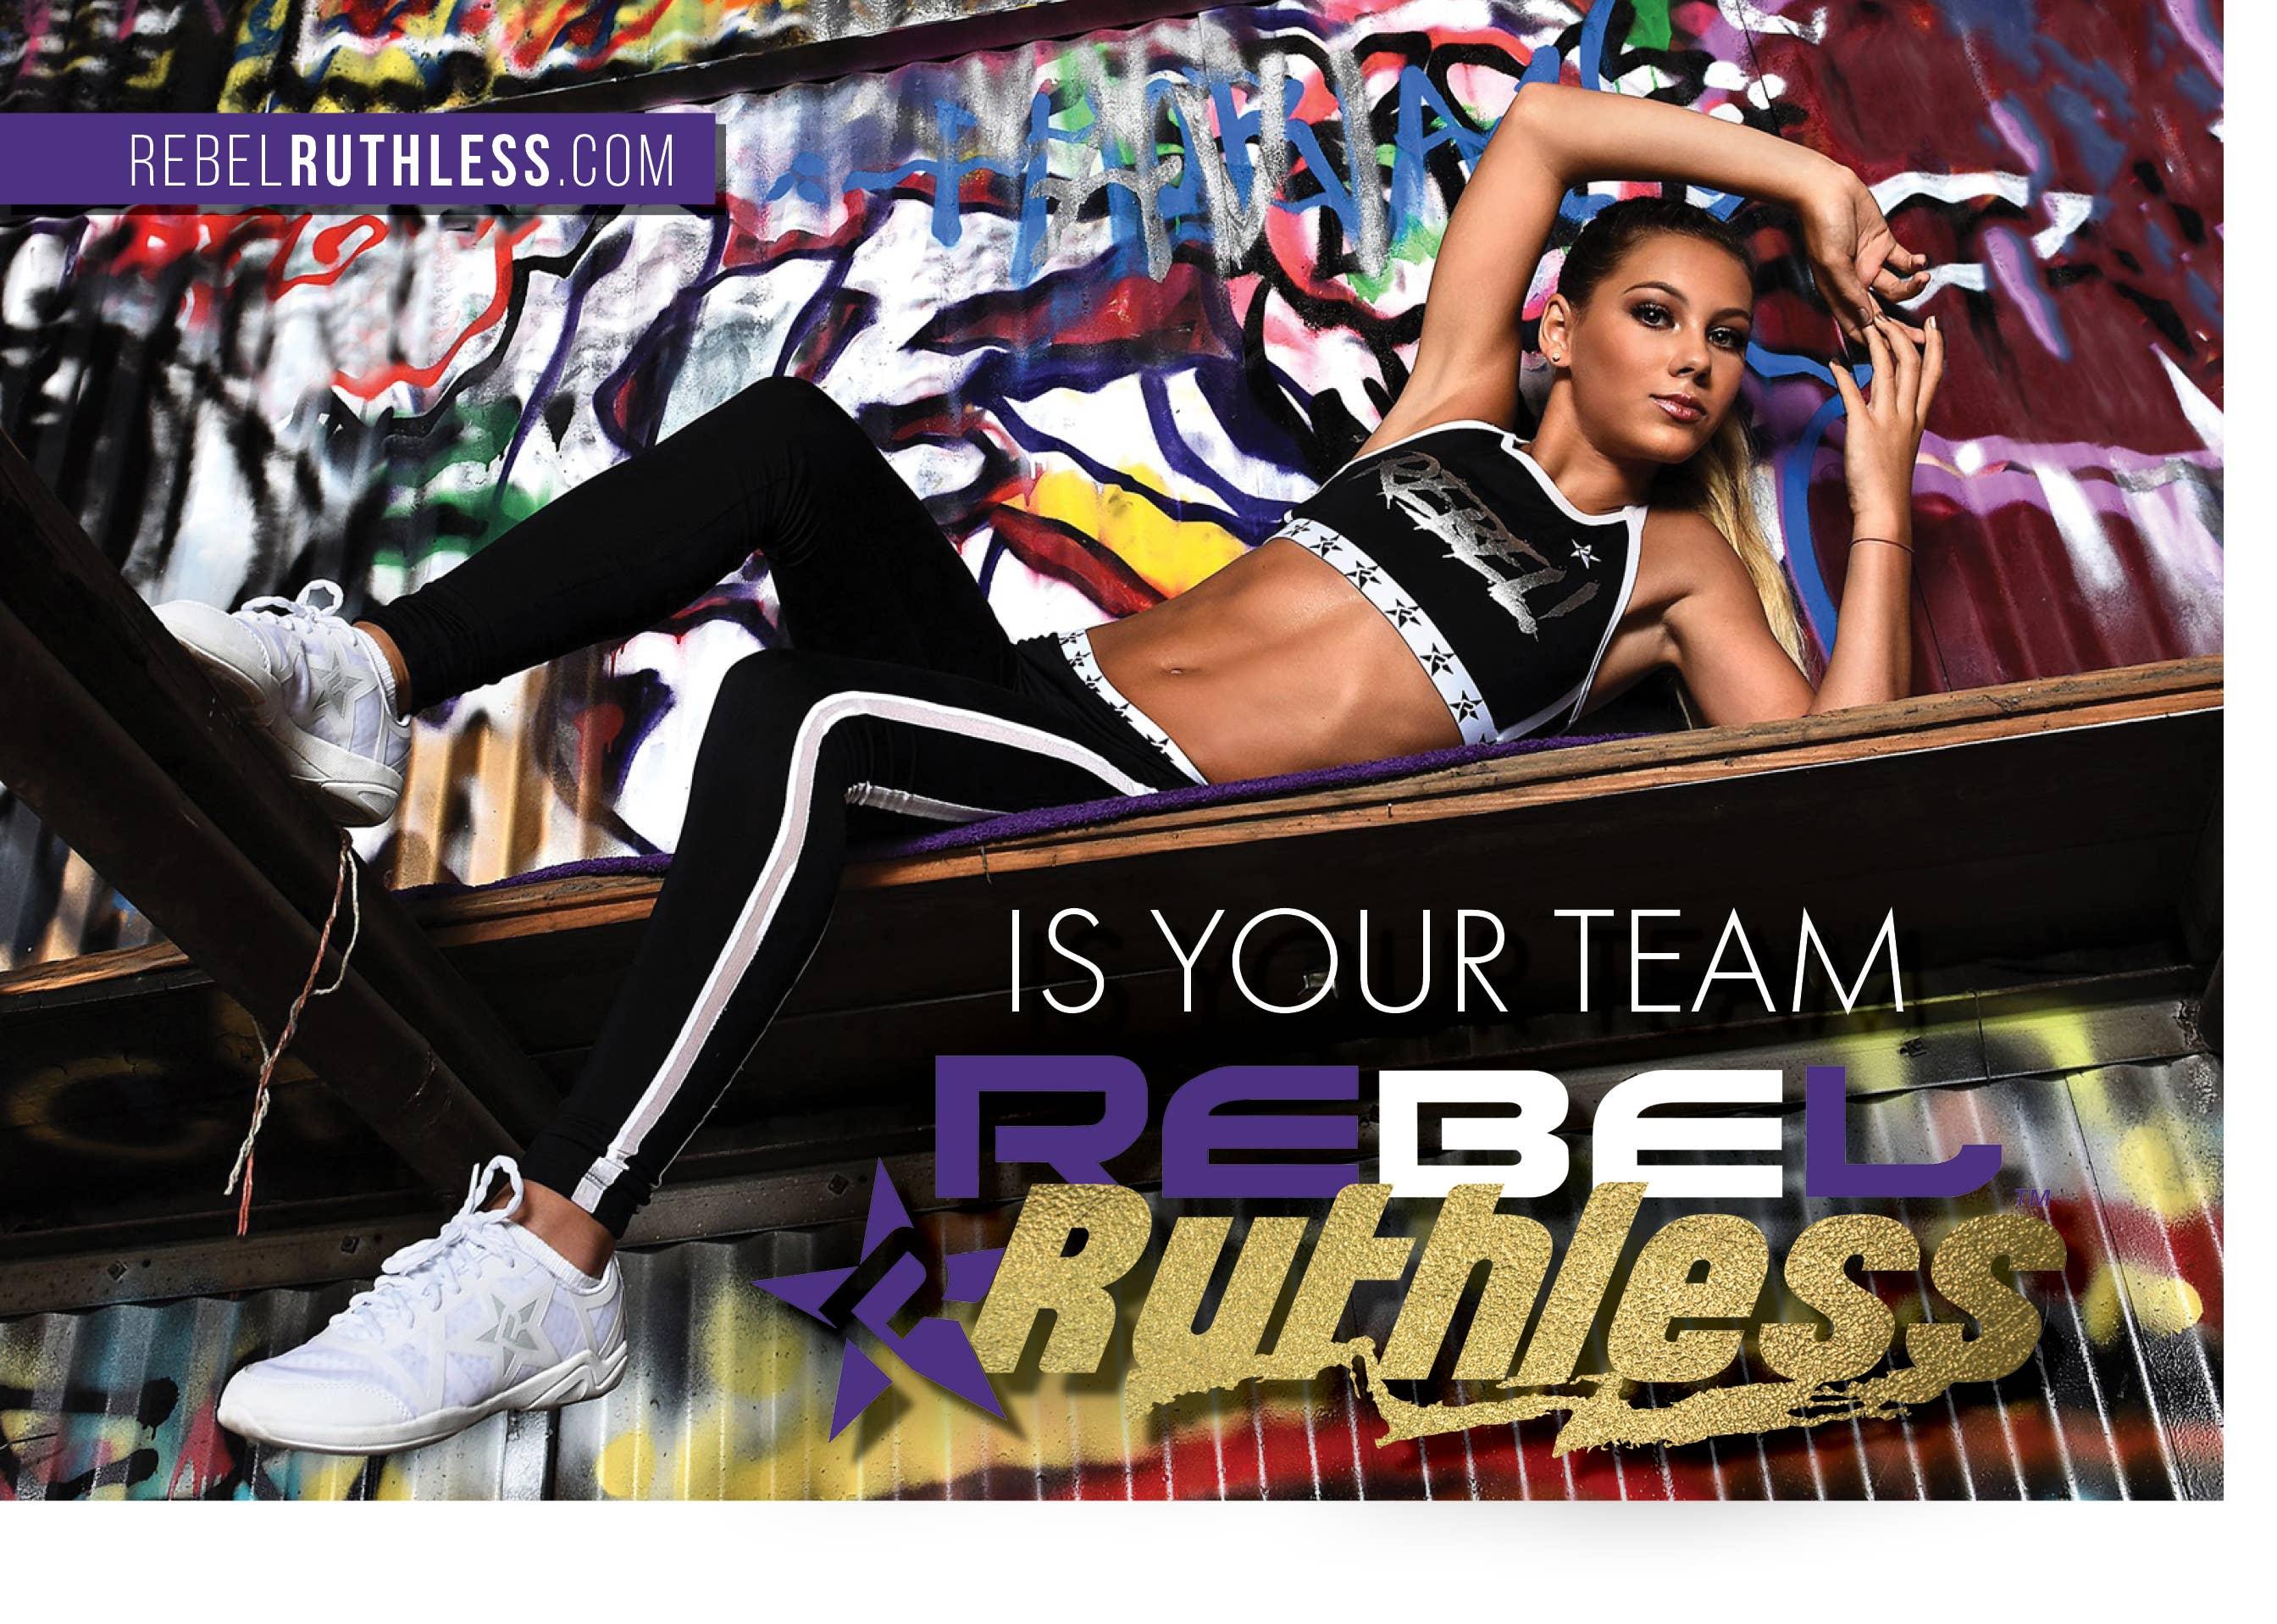 Rebel Ruthless Team